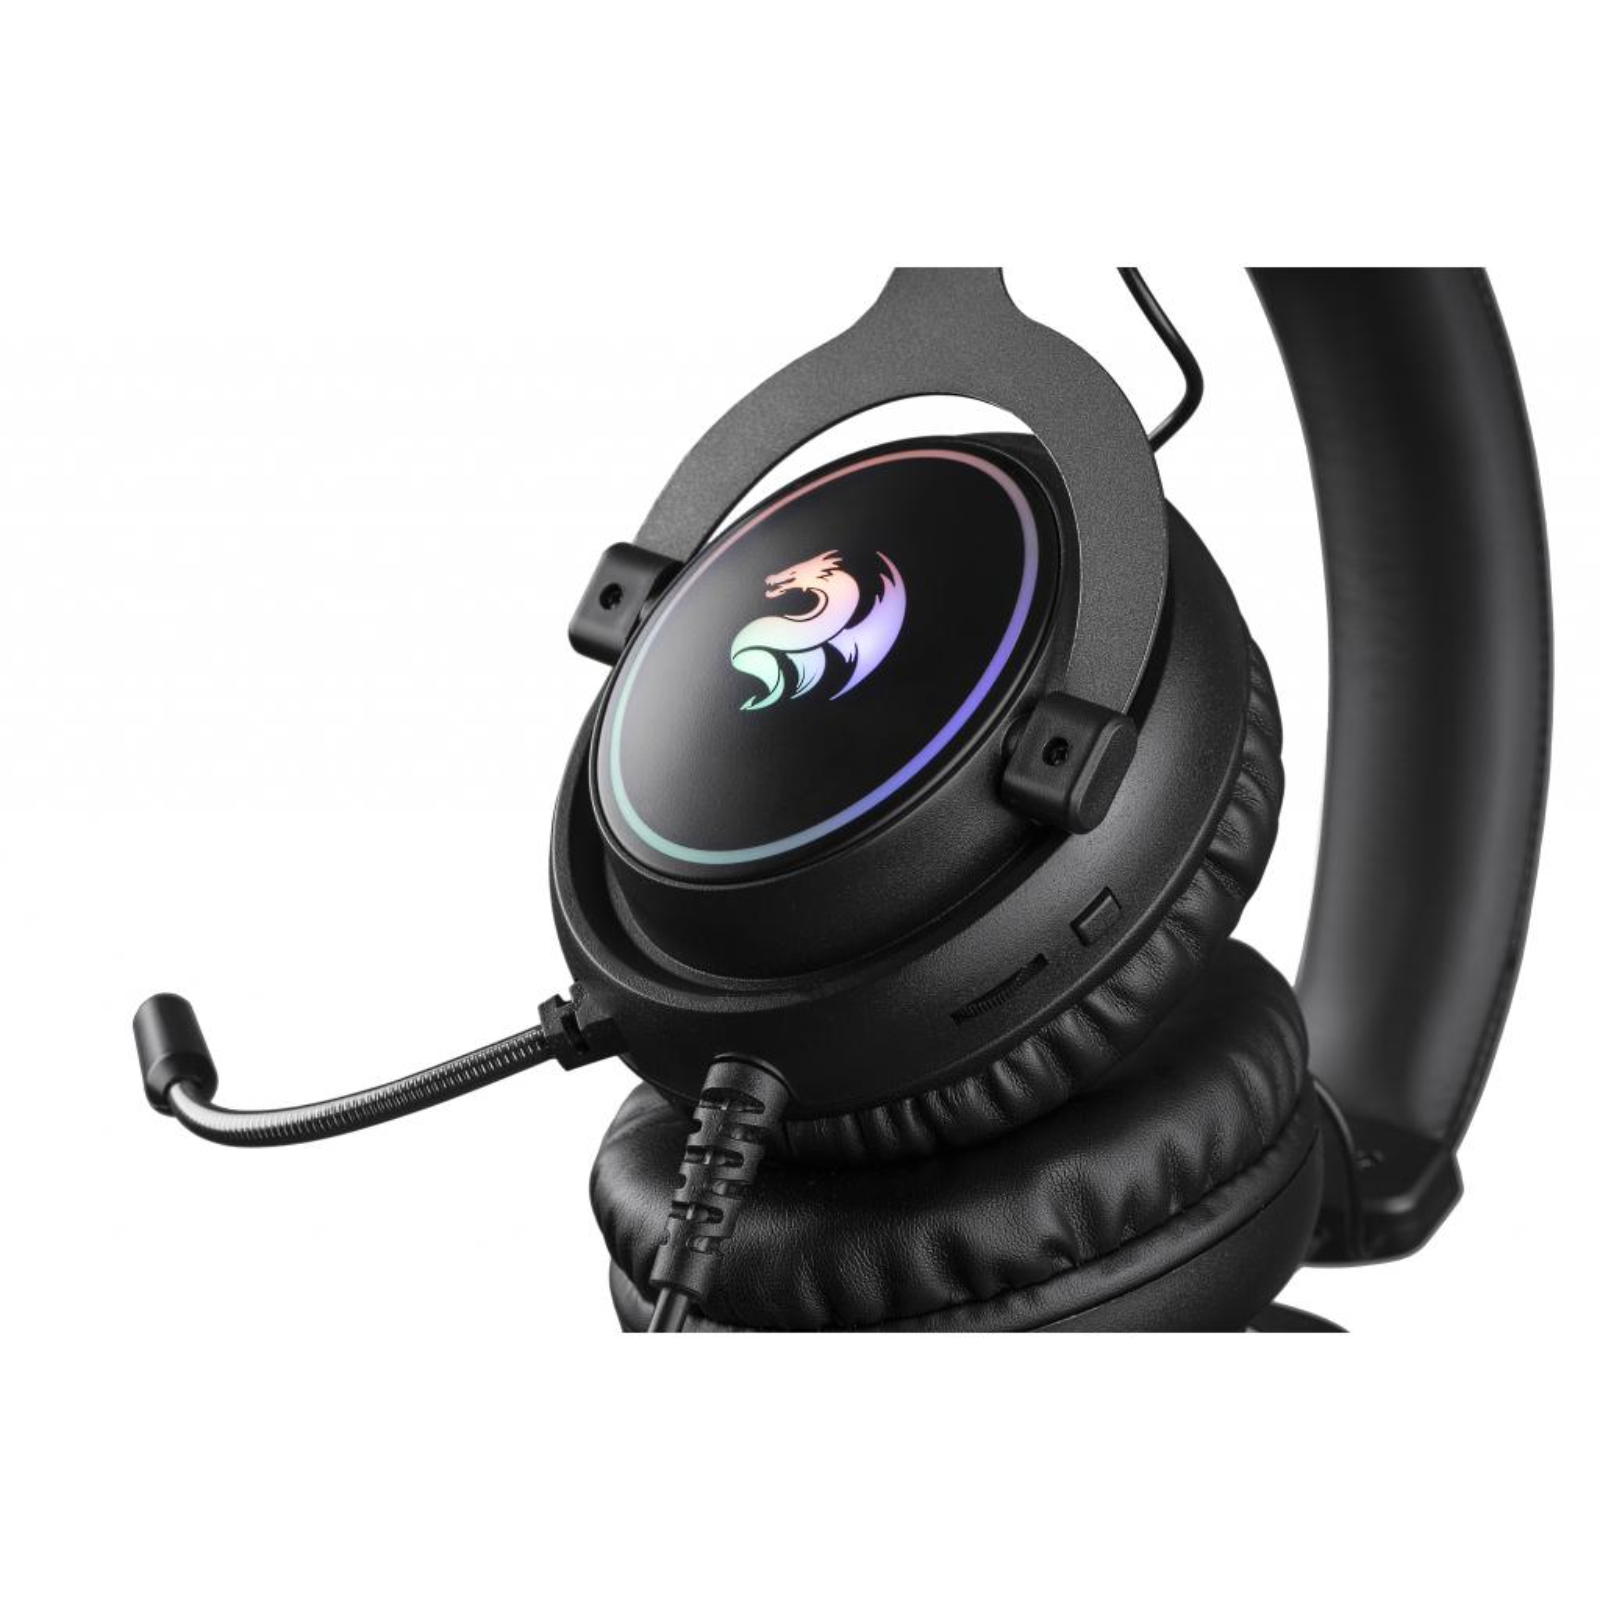 Навушники 2E Gaming HG320 LED Black (2E-HG320B) зображення 3